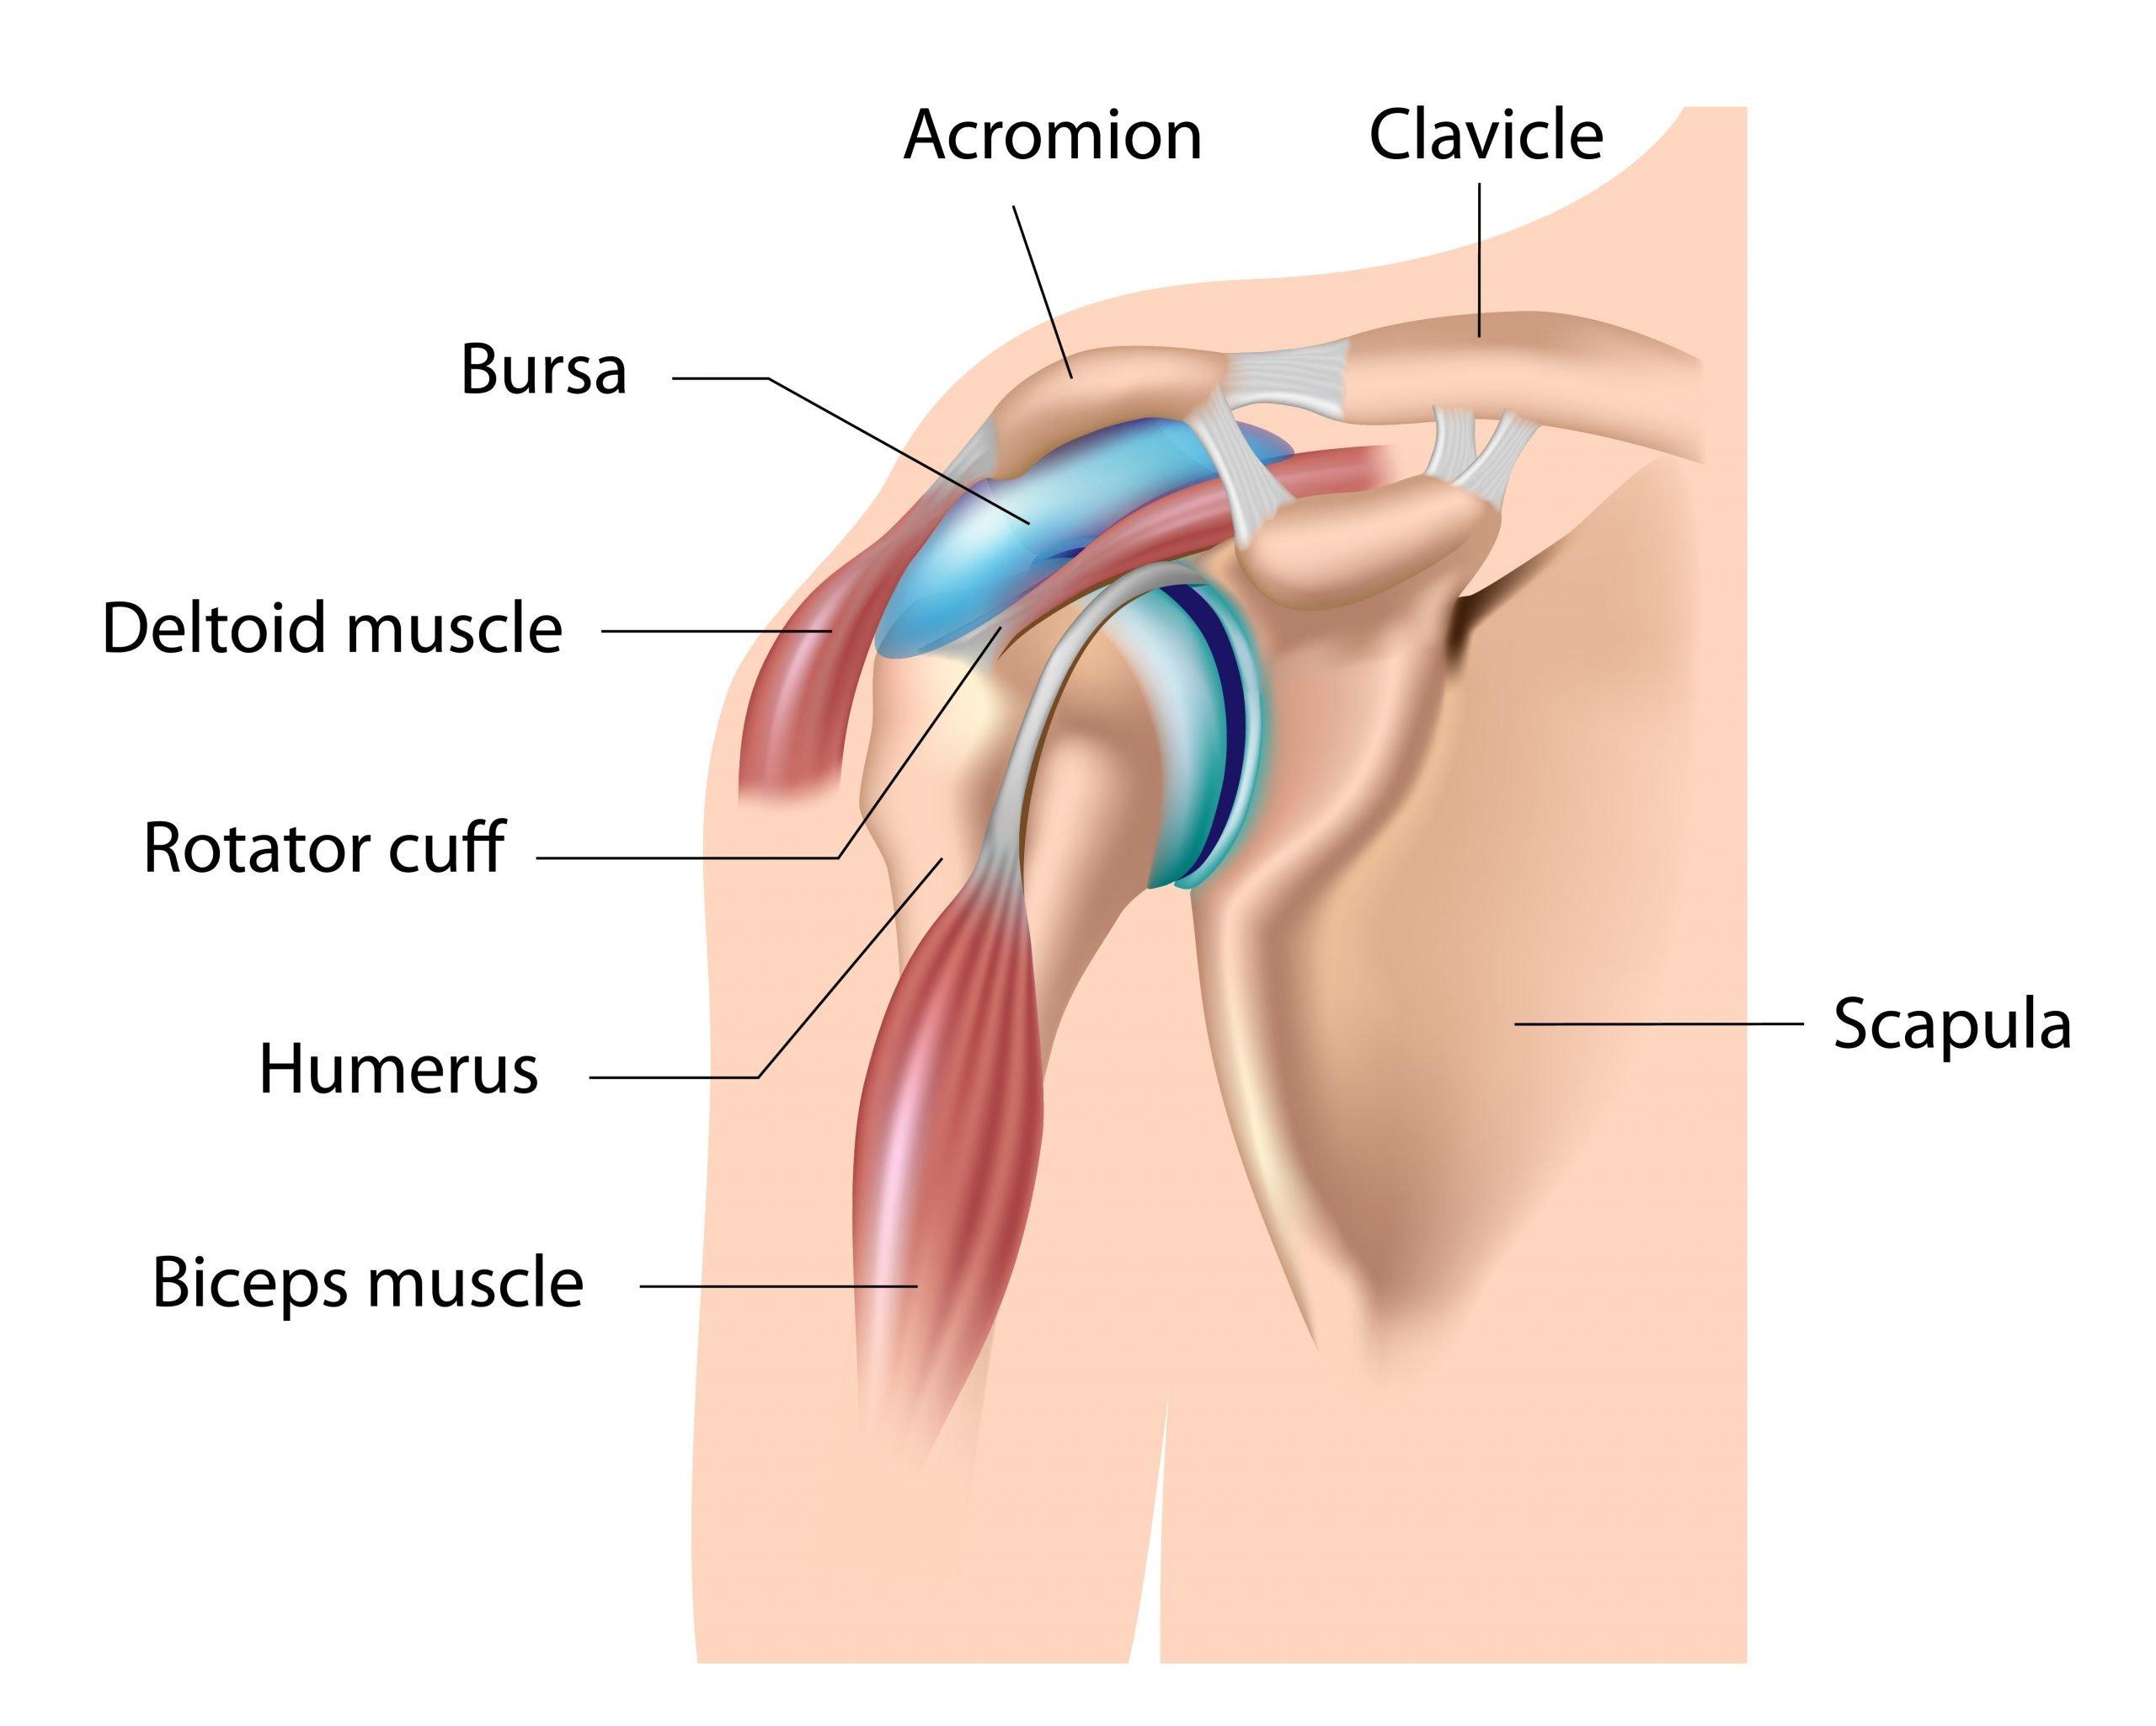 Shoulder Arthritis: Treatment for Younger, Active Patients